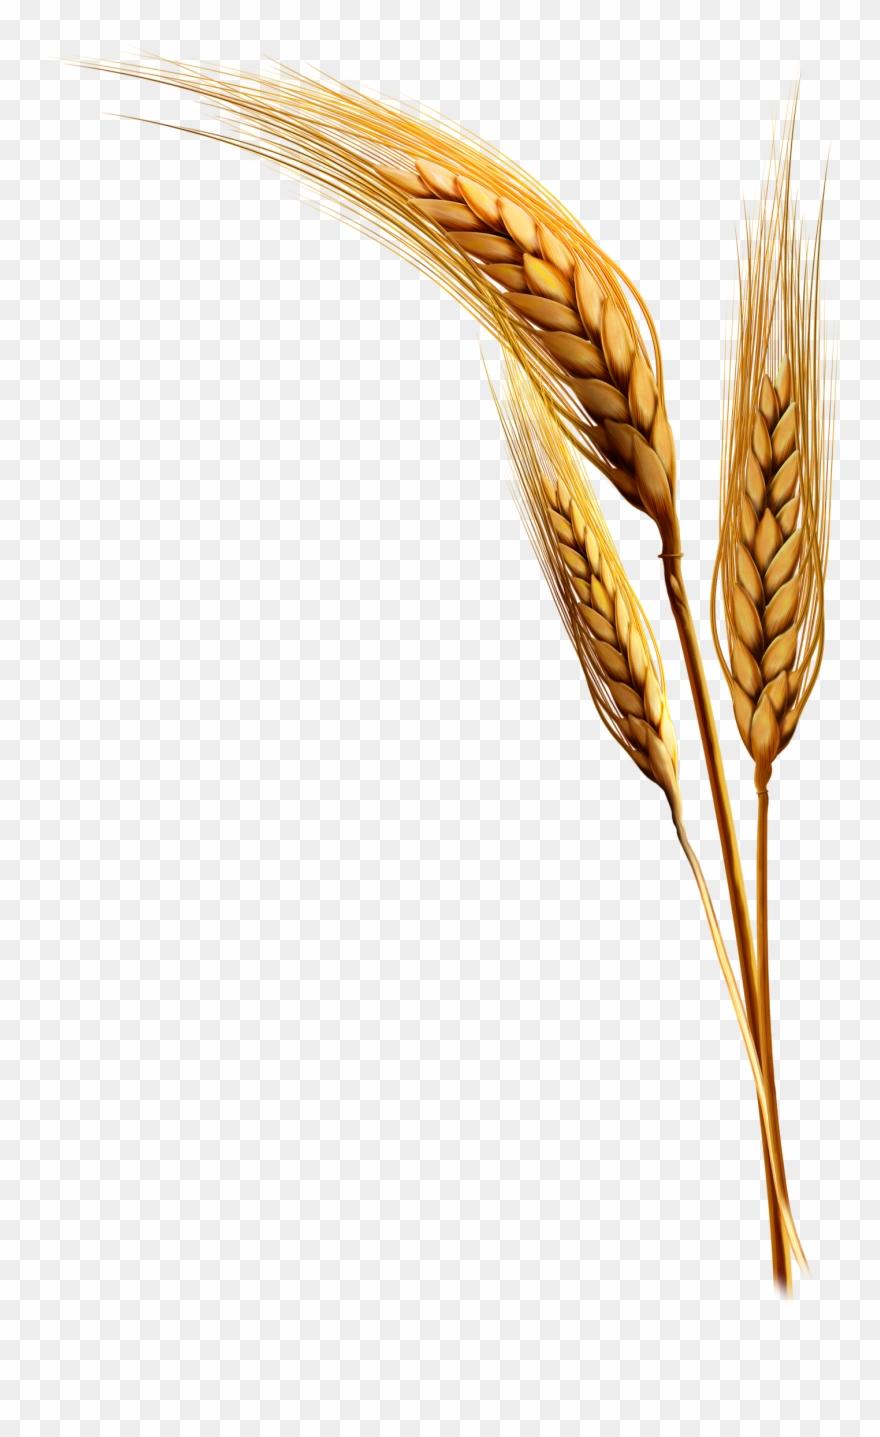 Grains clipart wheat plant. Emmer rice clip art